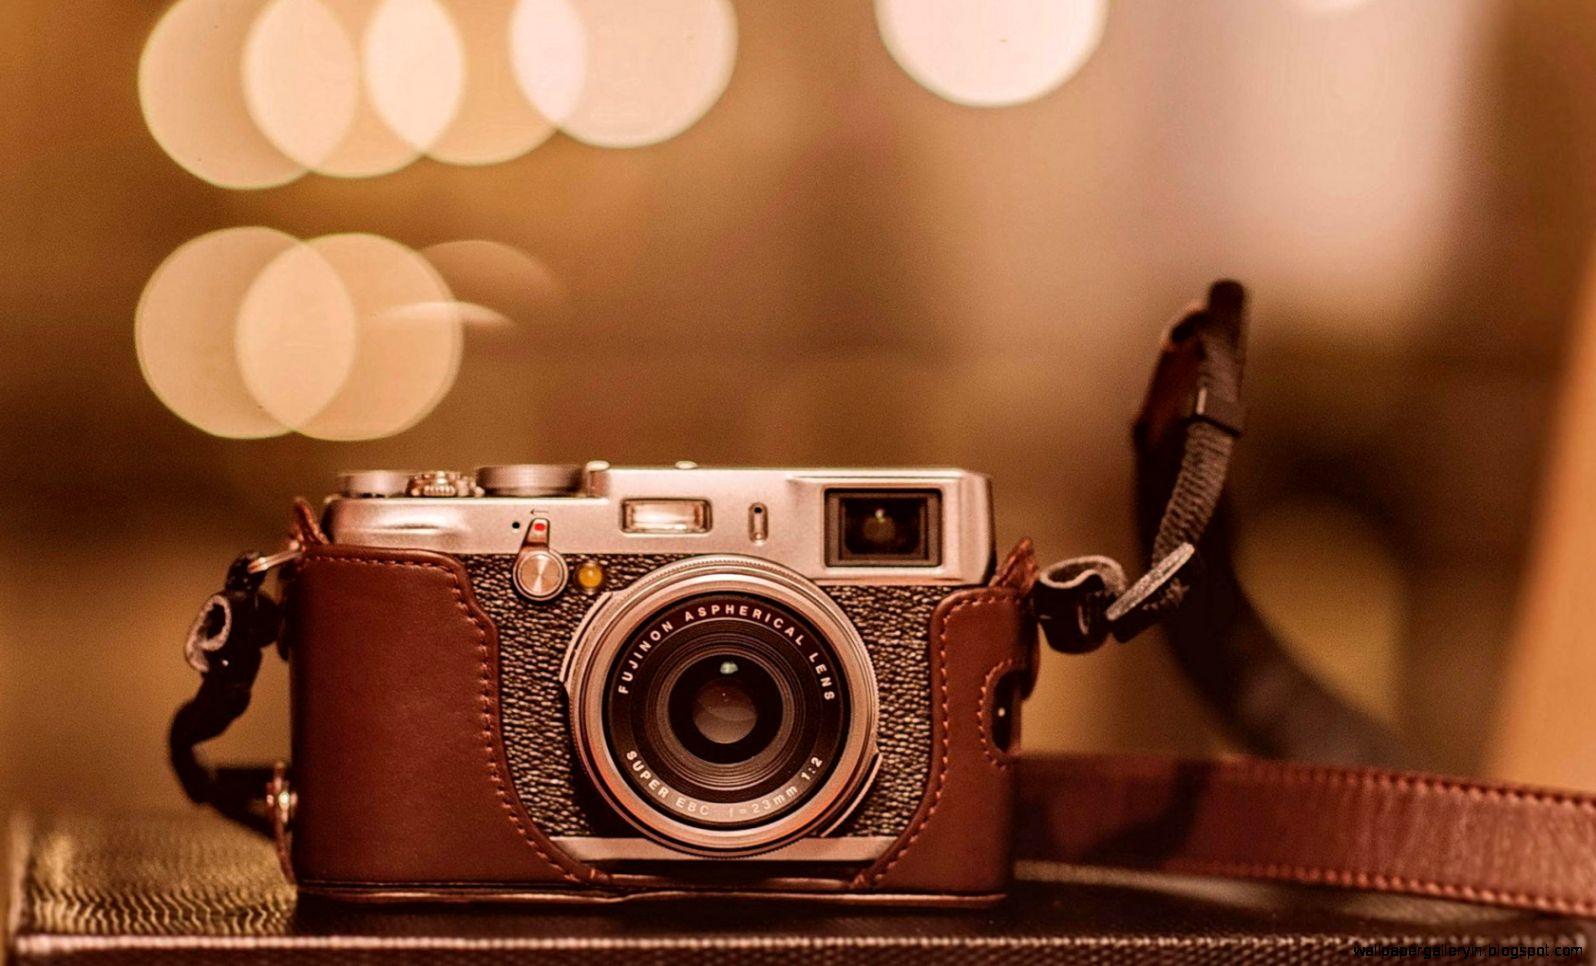 Photography Vintage Camera Hd Wallpaper | Wallpaper Gallery